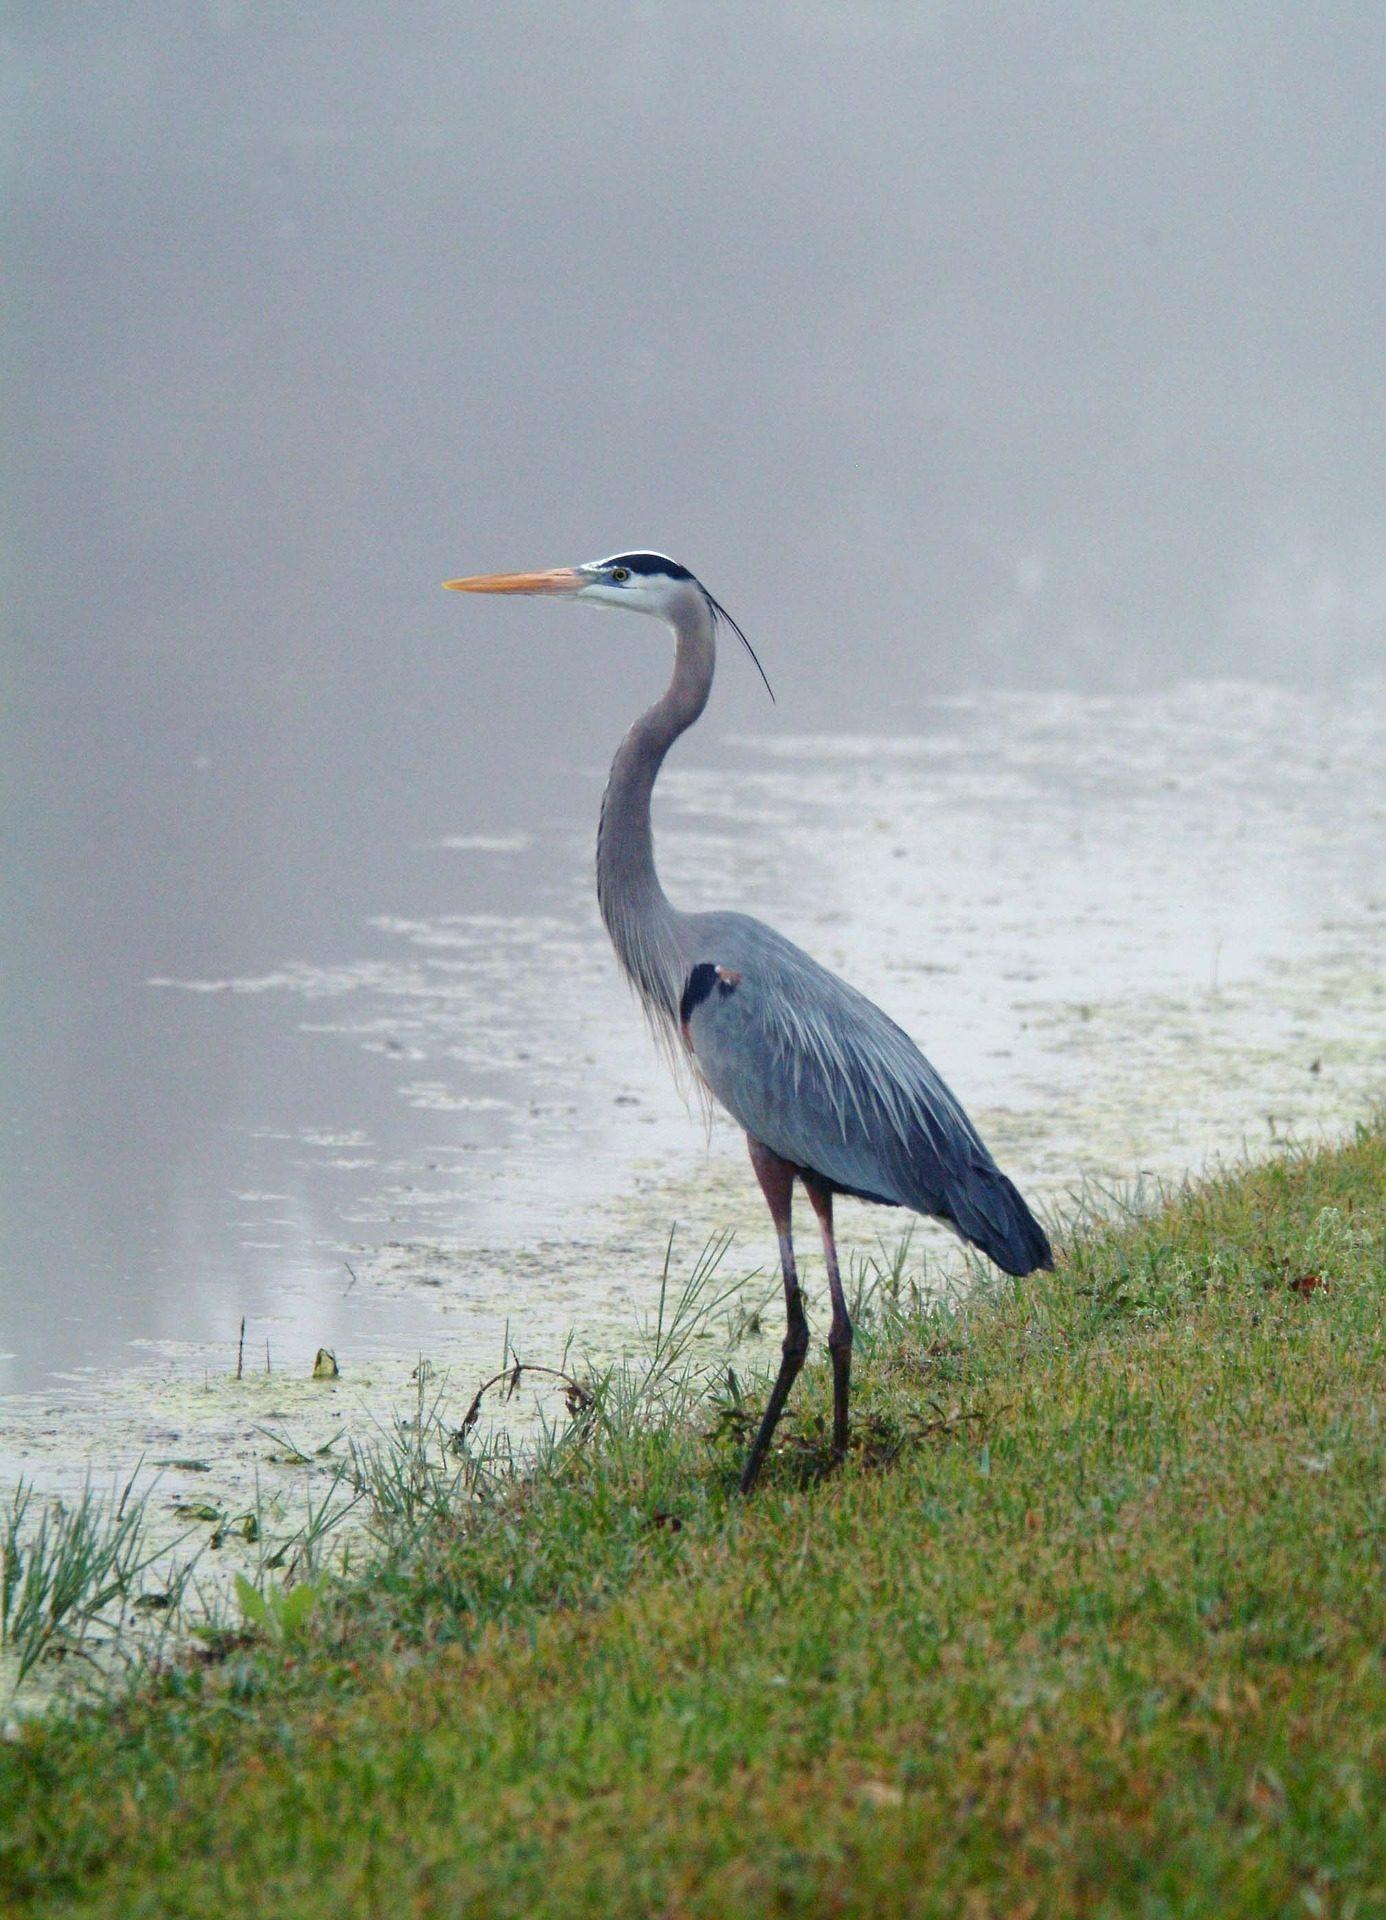 Crane Oiseau Ave Marsh Laguna Sauvage Liberte Fonds